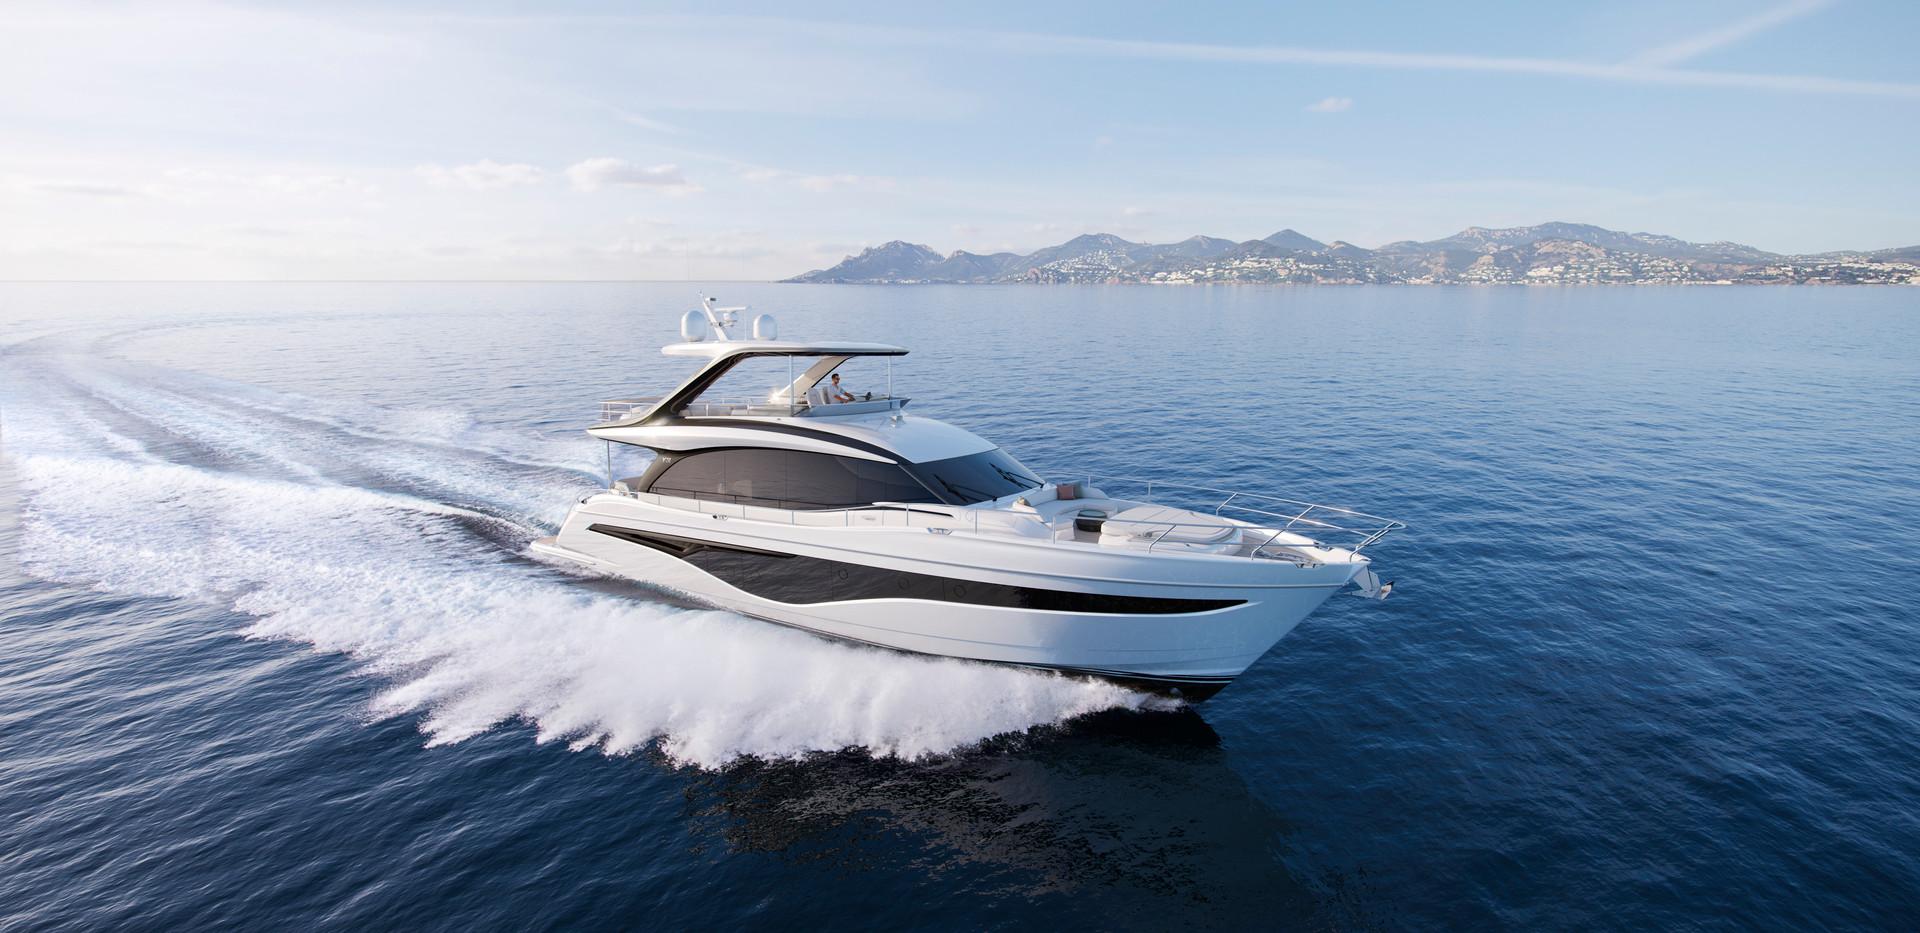 y72-exterior-white-hull-cgi.jpg